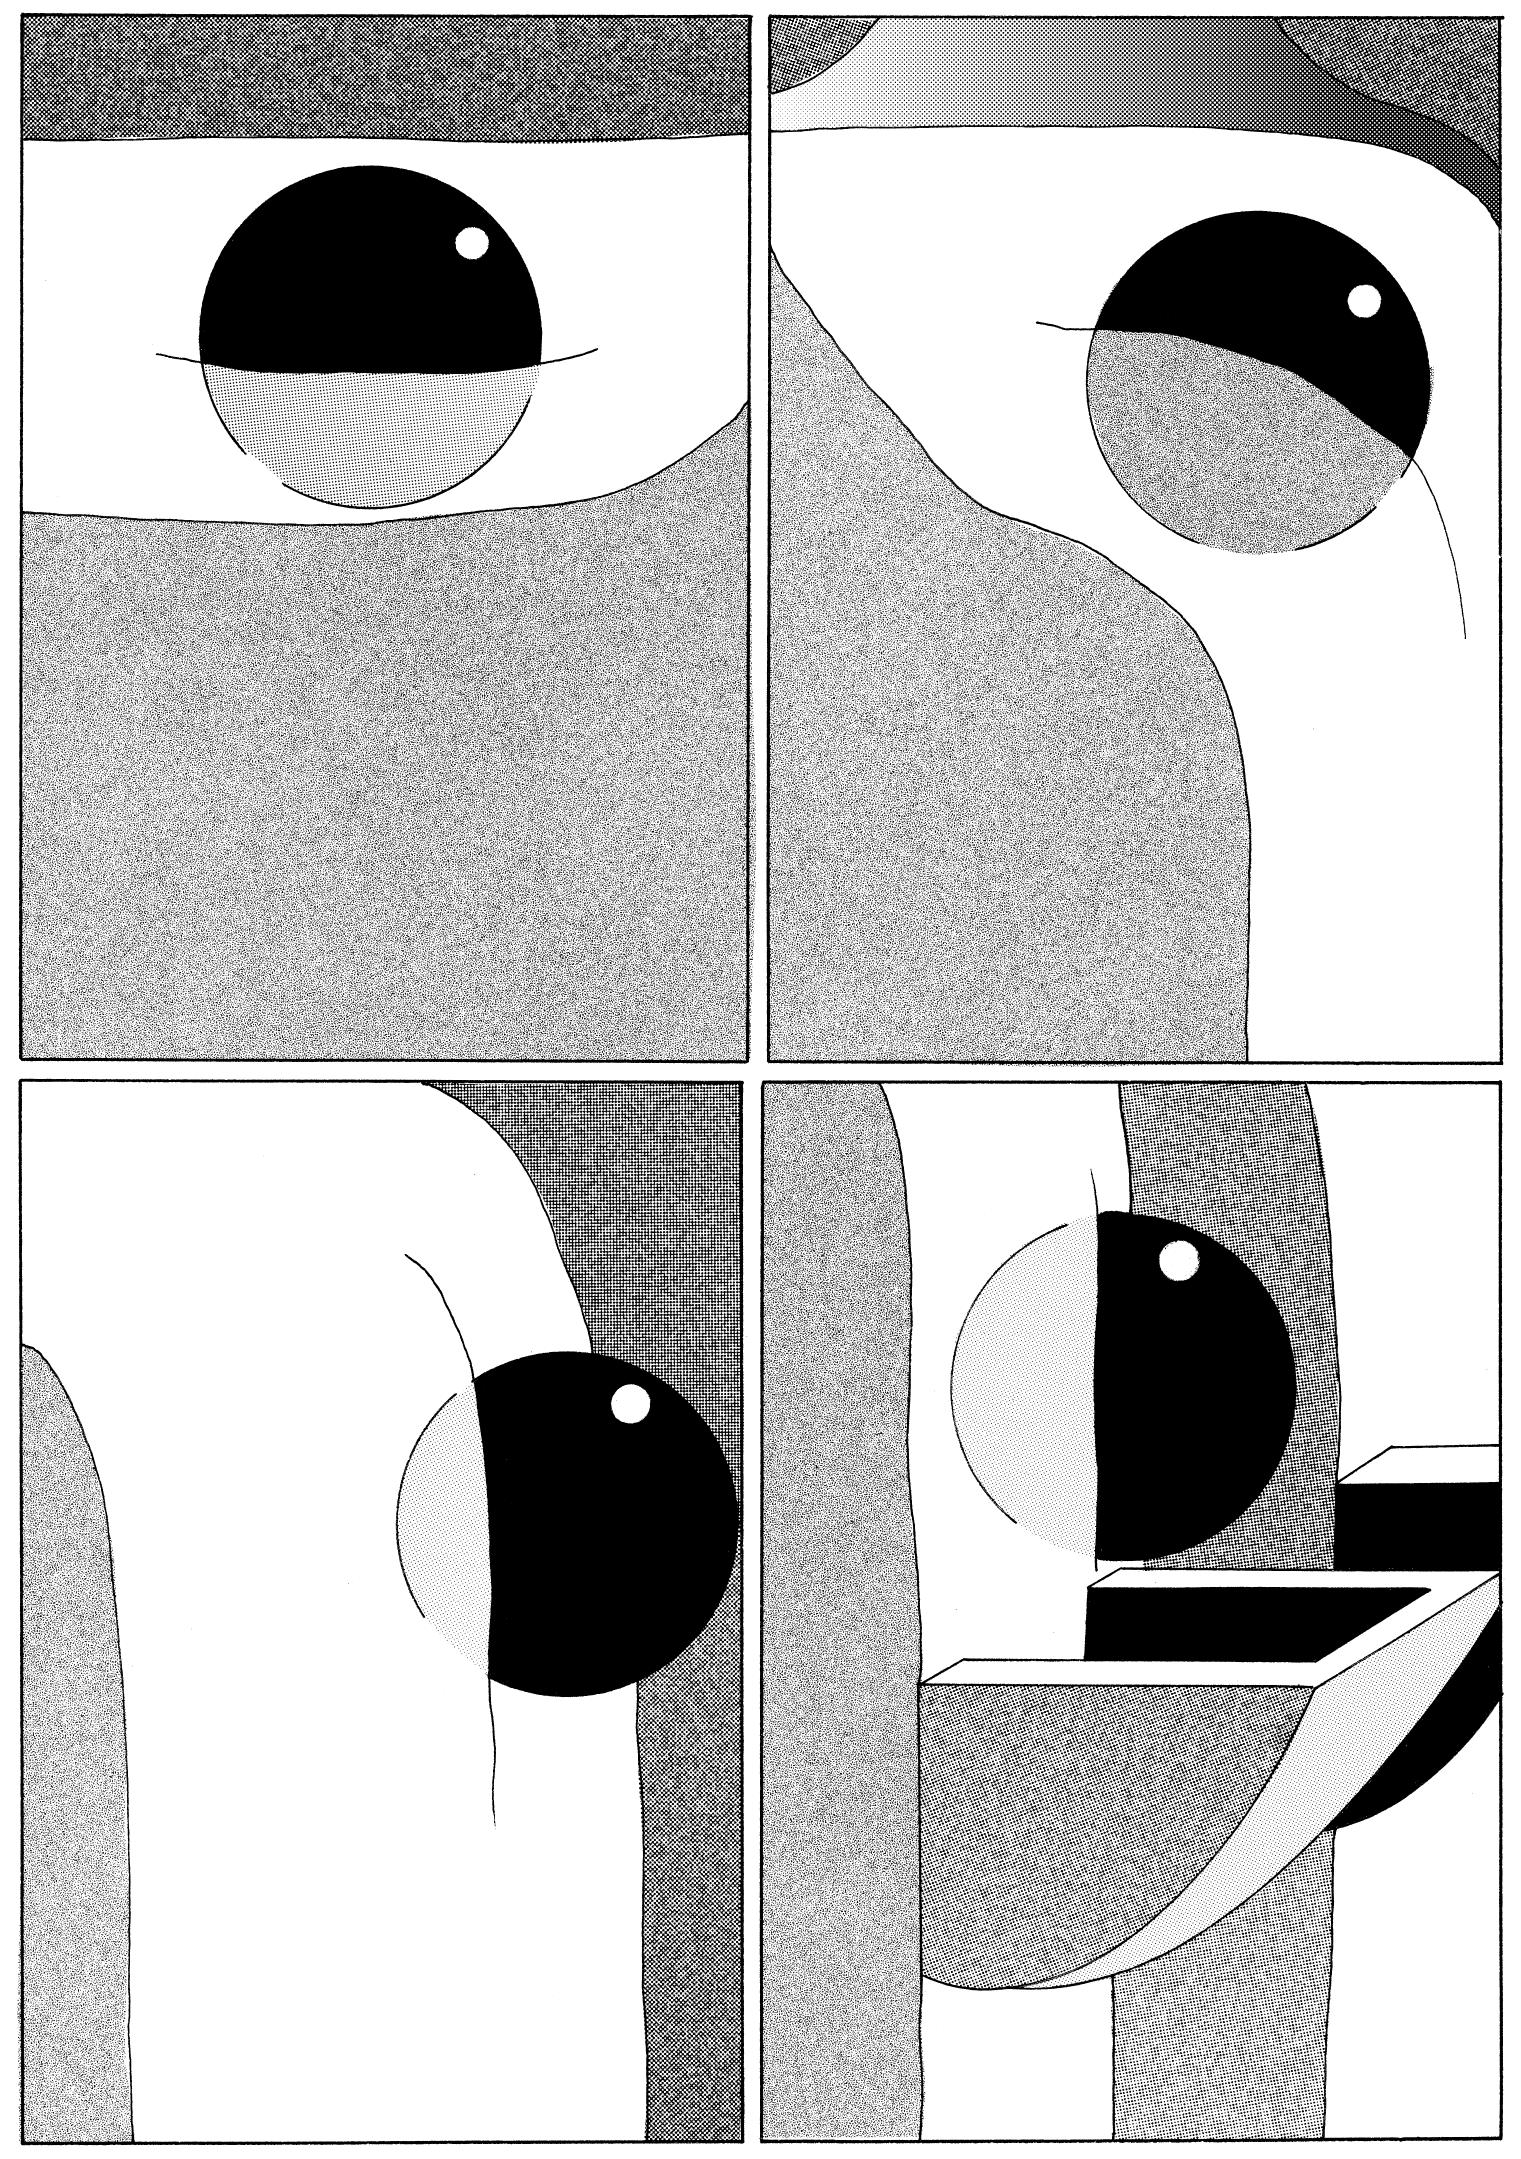 QQMAGV__complet-98